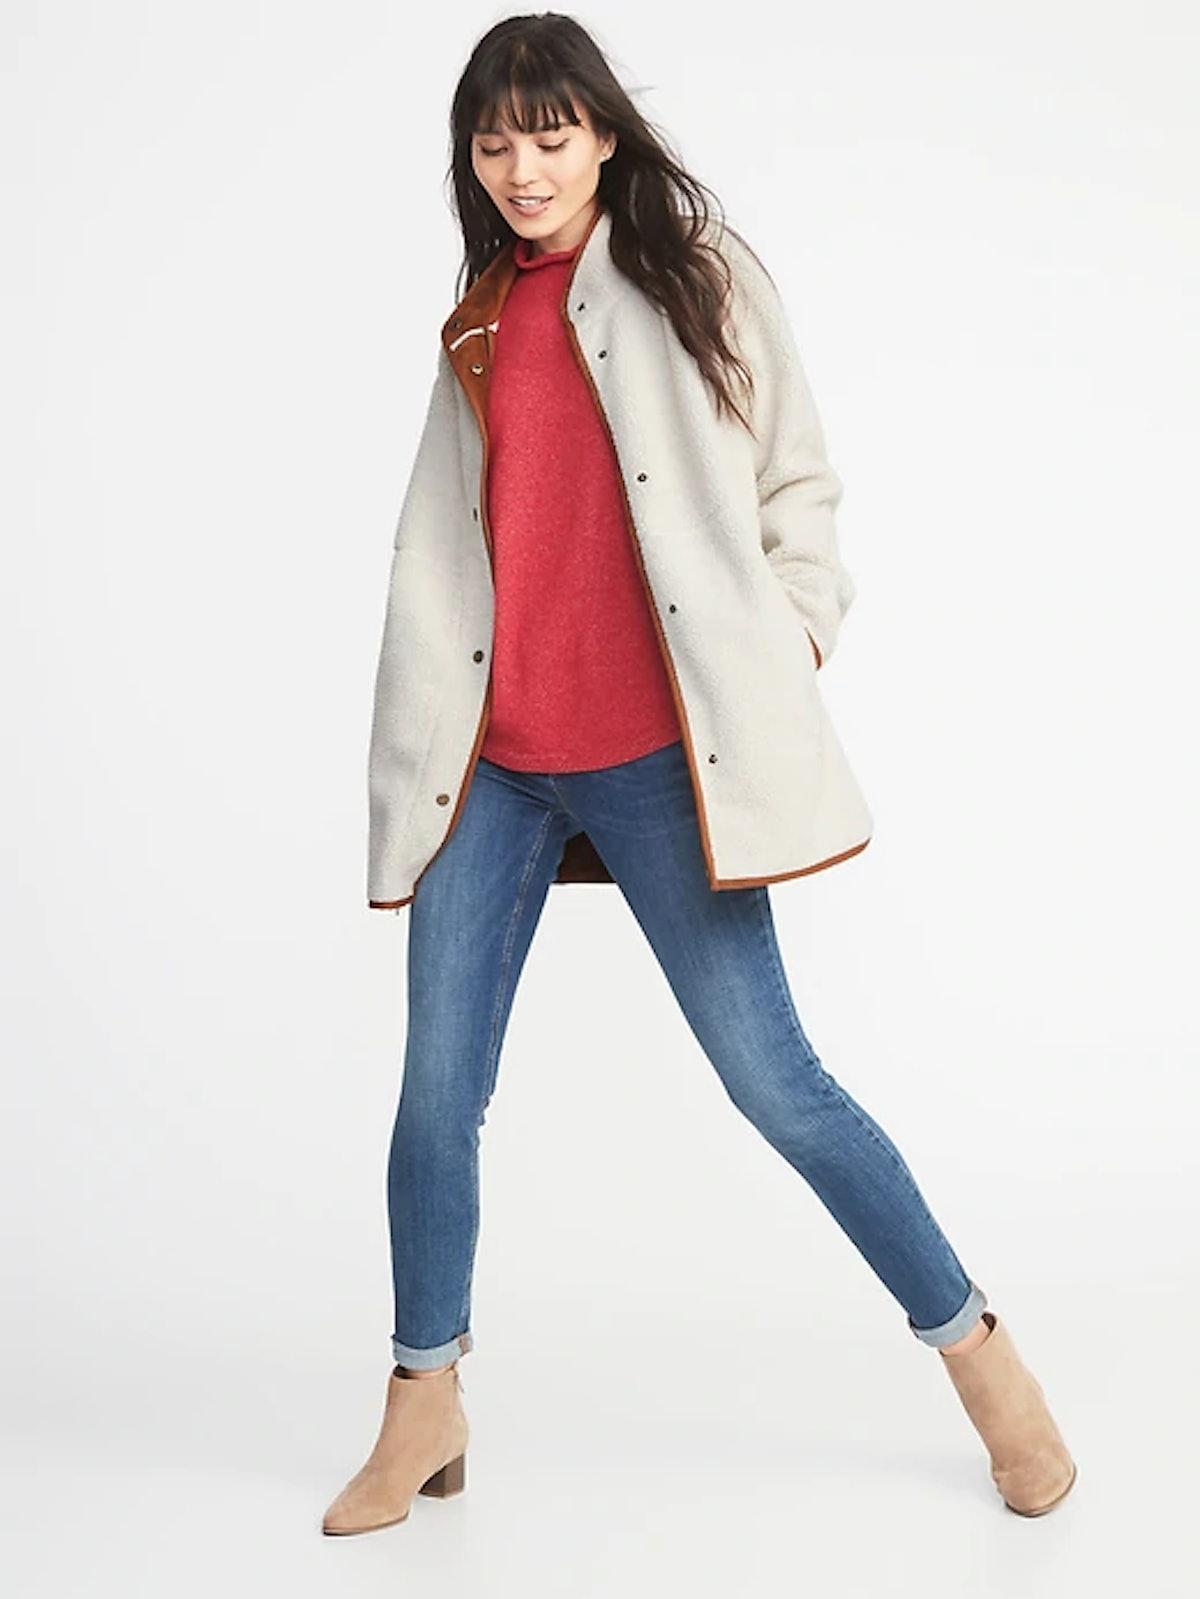 Long Sherpa Faux-Suede Lined Coat for Women